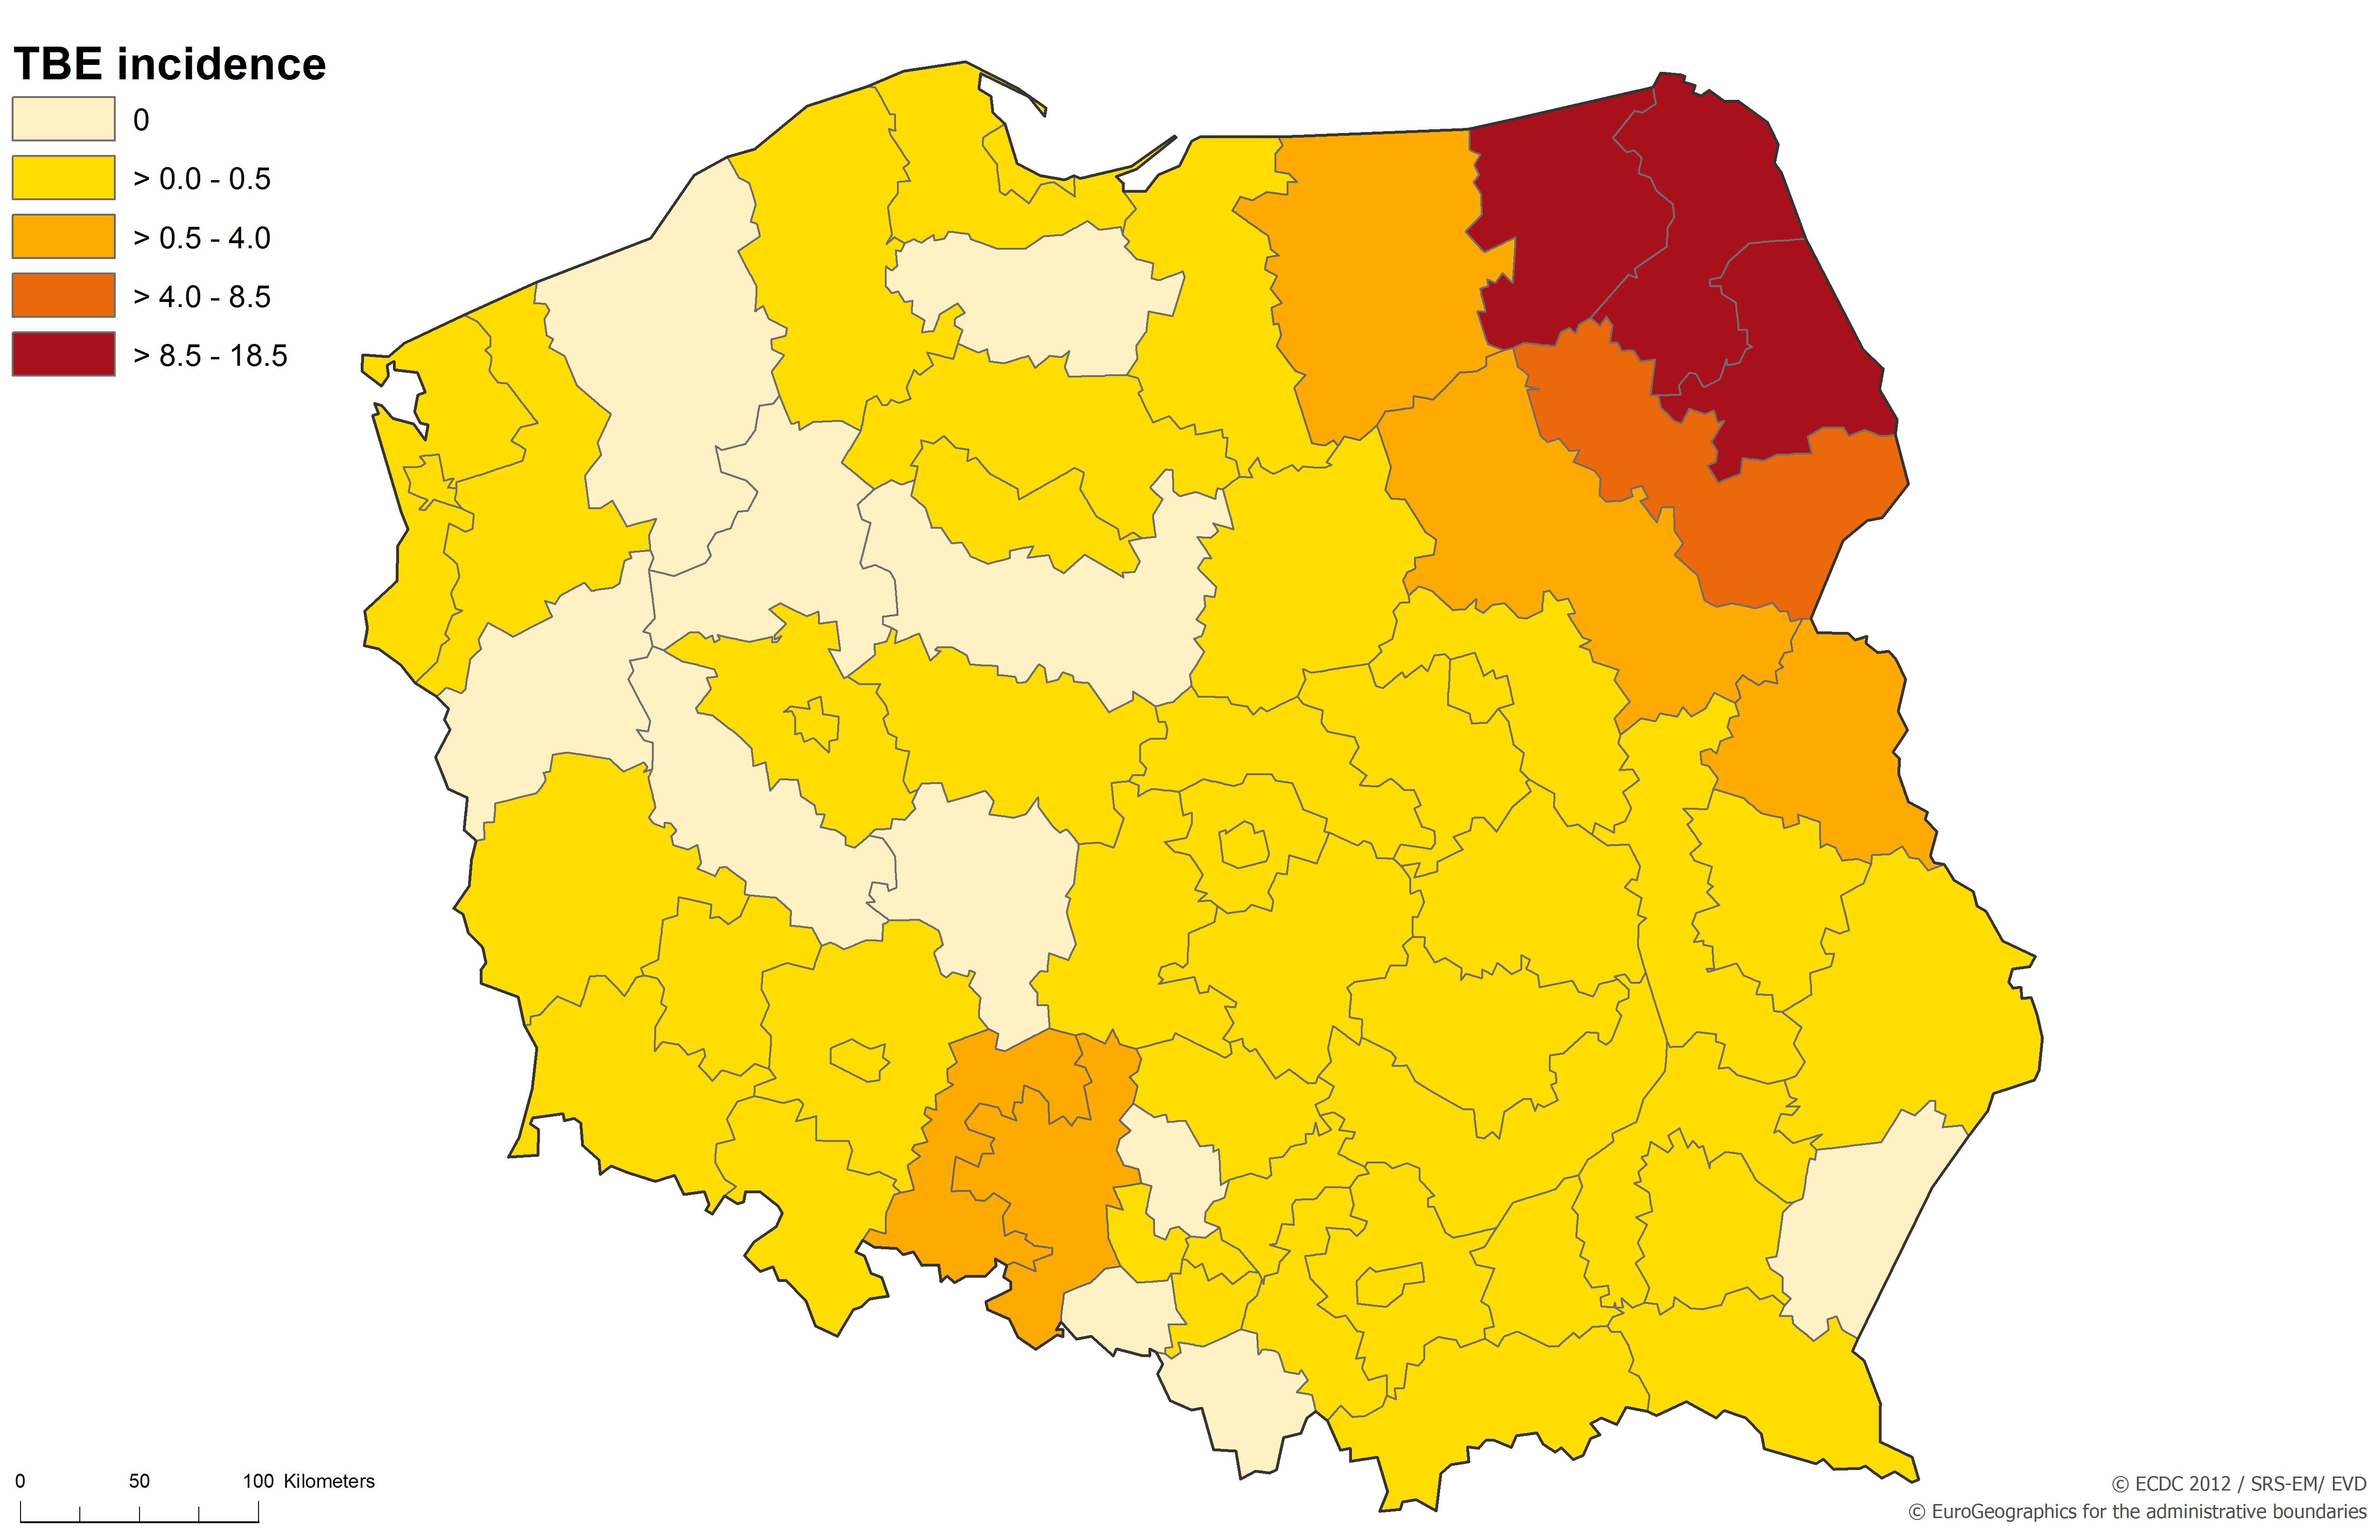 tick borne encephalitis europe map Country profile: Poland. Tick borne encephalitis (TBE)